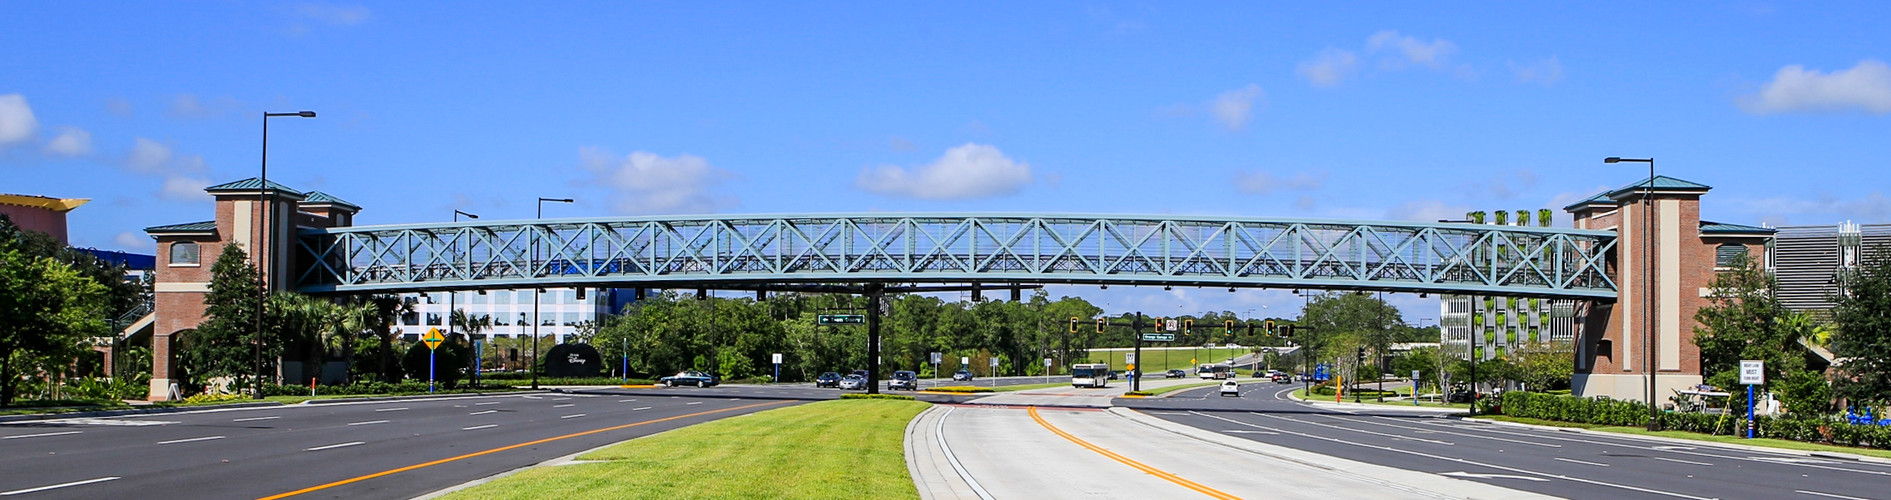 Pedestrian Bridge over Buena Vista Drive